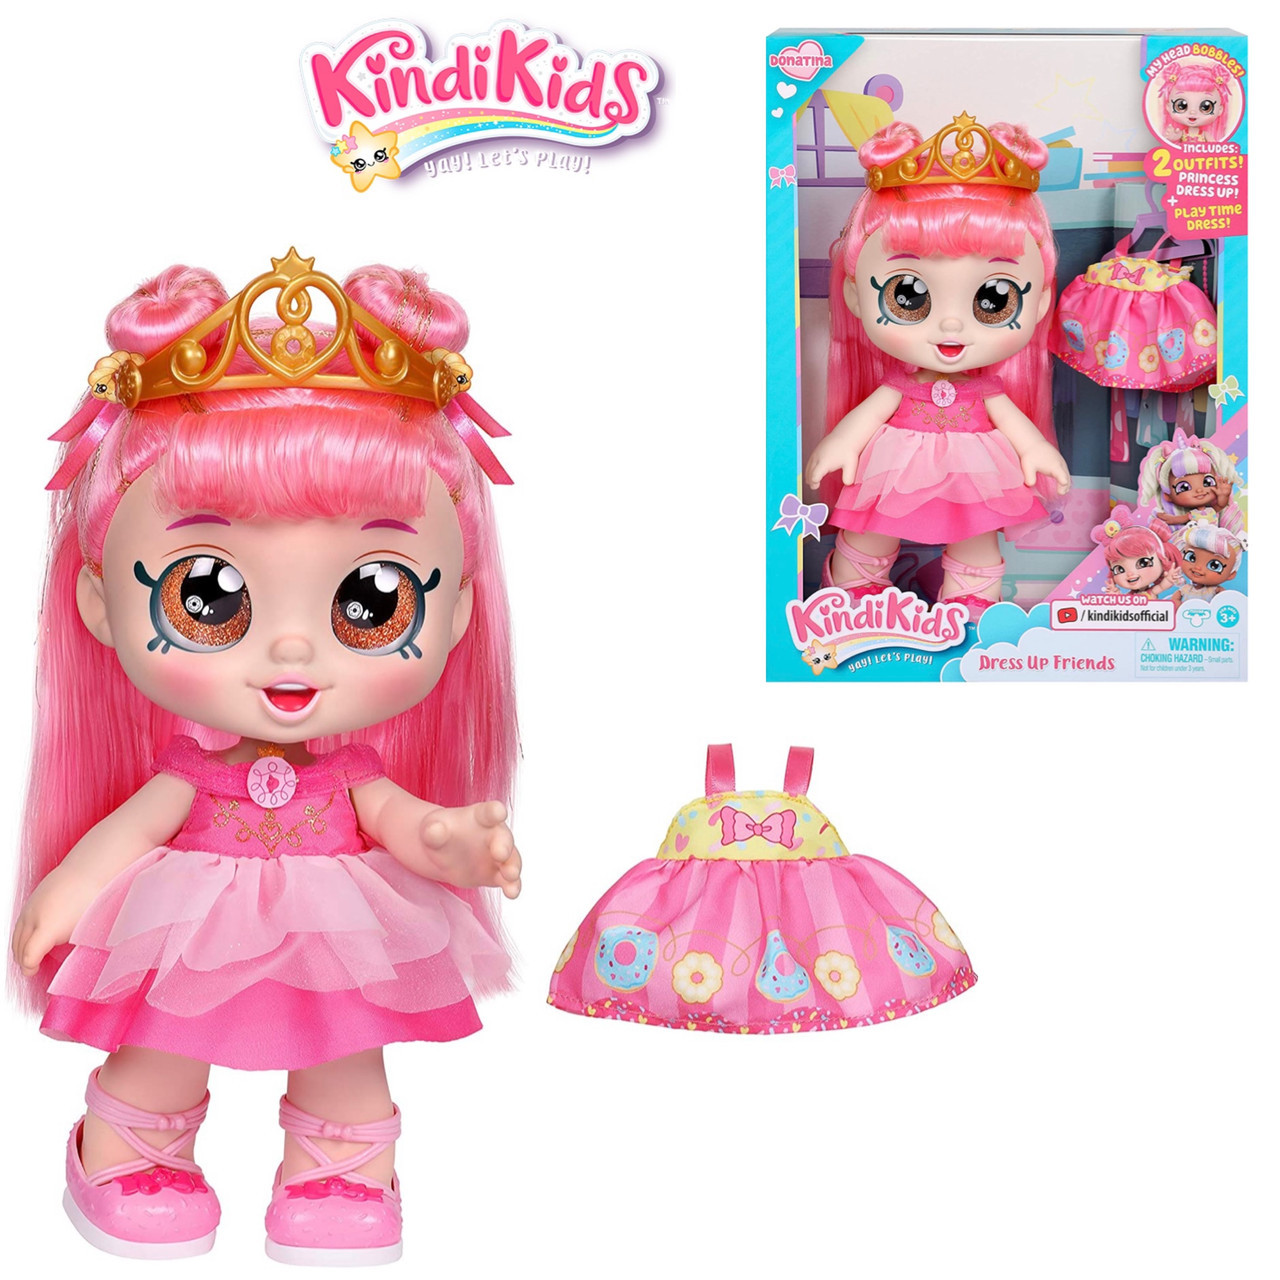 Кукла Кинди Кидс Марша Меллоу из серии Наряжай друга Kindi Kids Marsha Mello Bunny